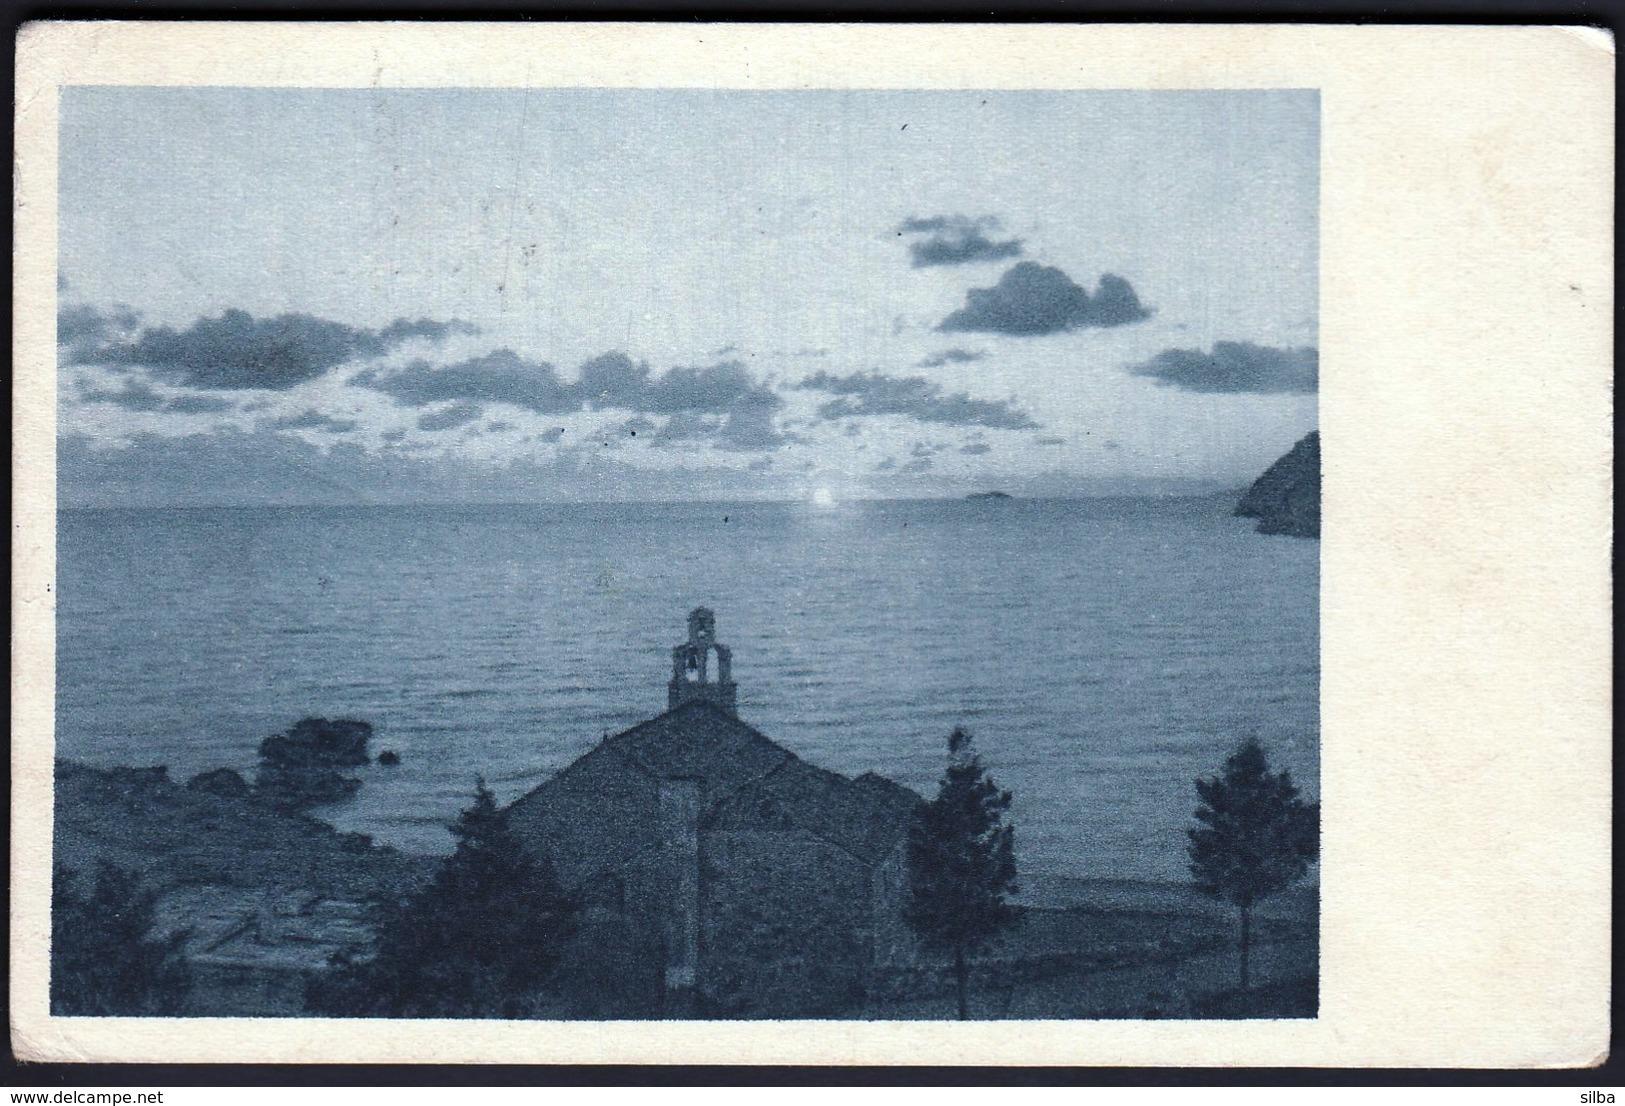 Croatia Dubrovnik, Ragusa 1935 / Dance / Chapel Cemetery - Croatia